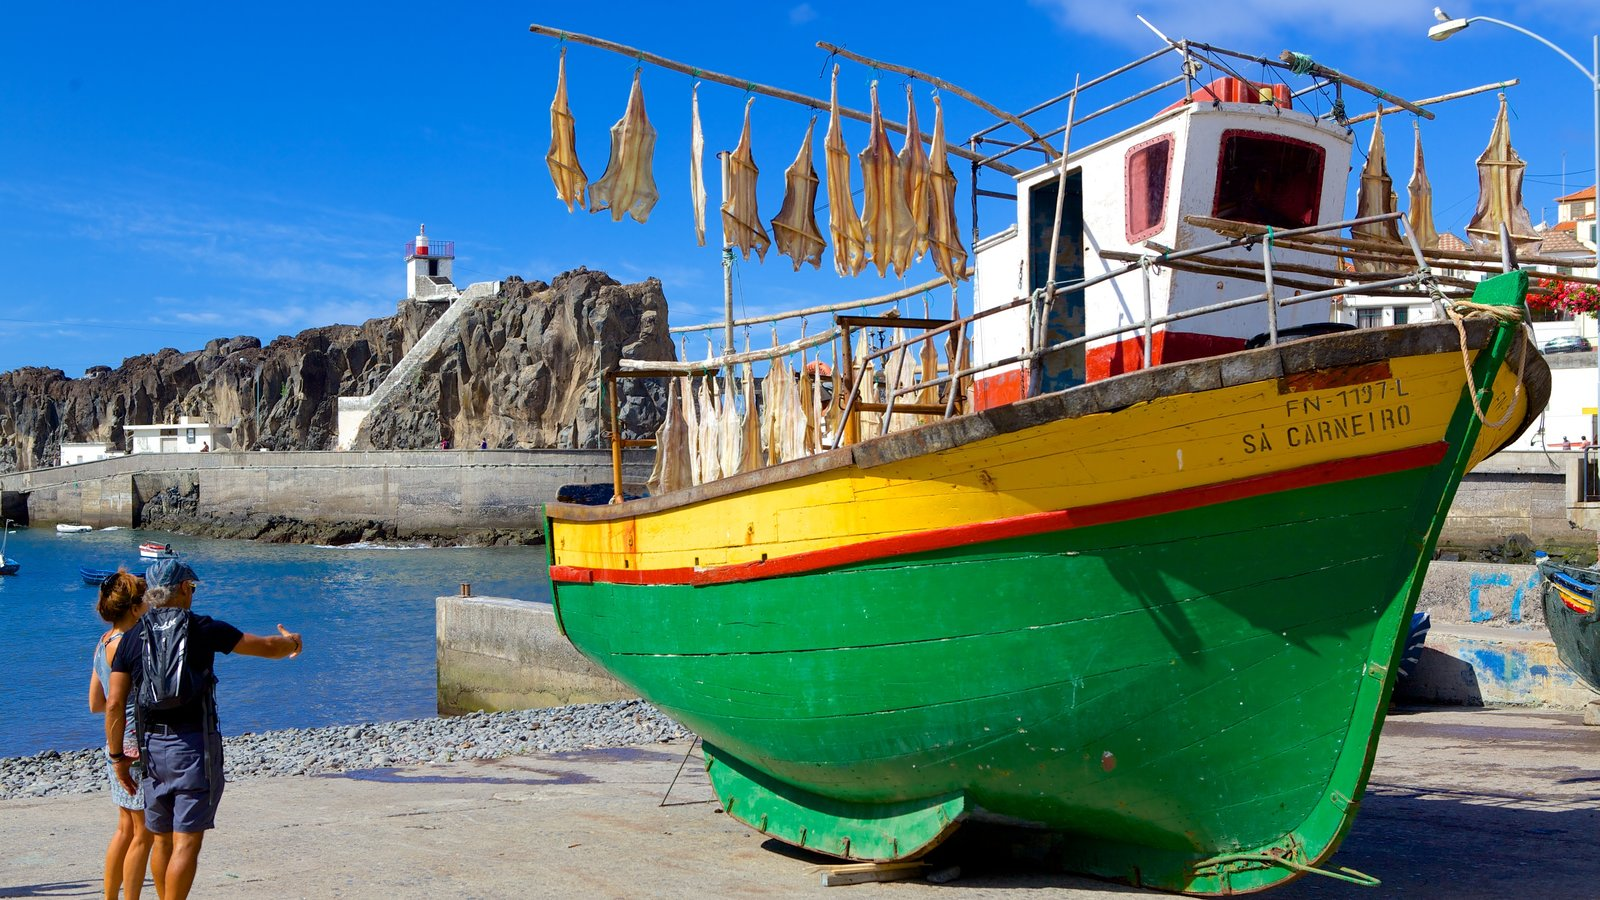 Camara de Lobos which includes a bay or harbor and a beach